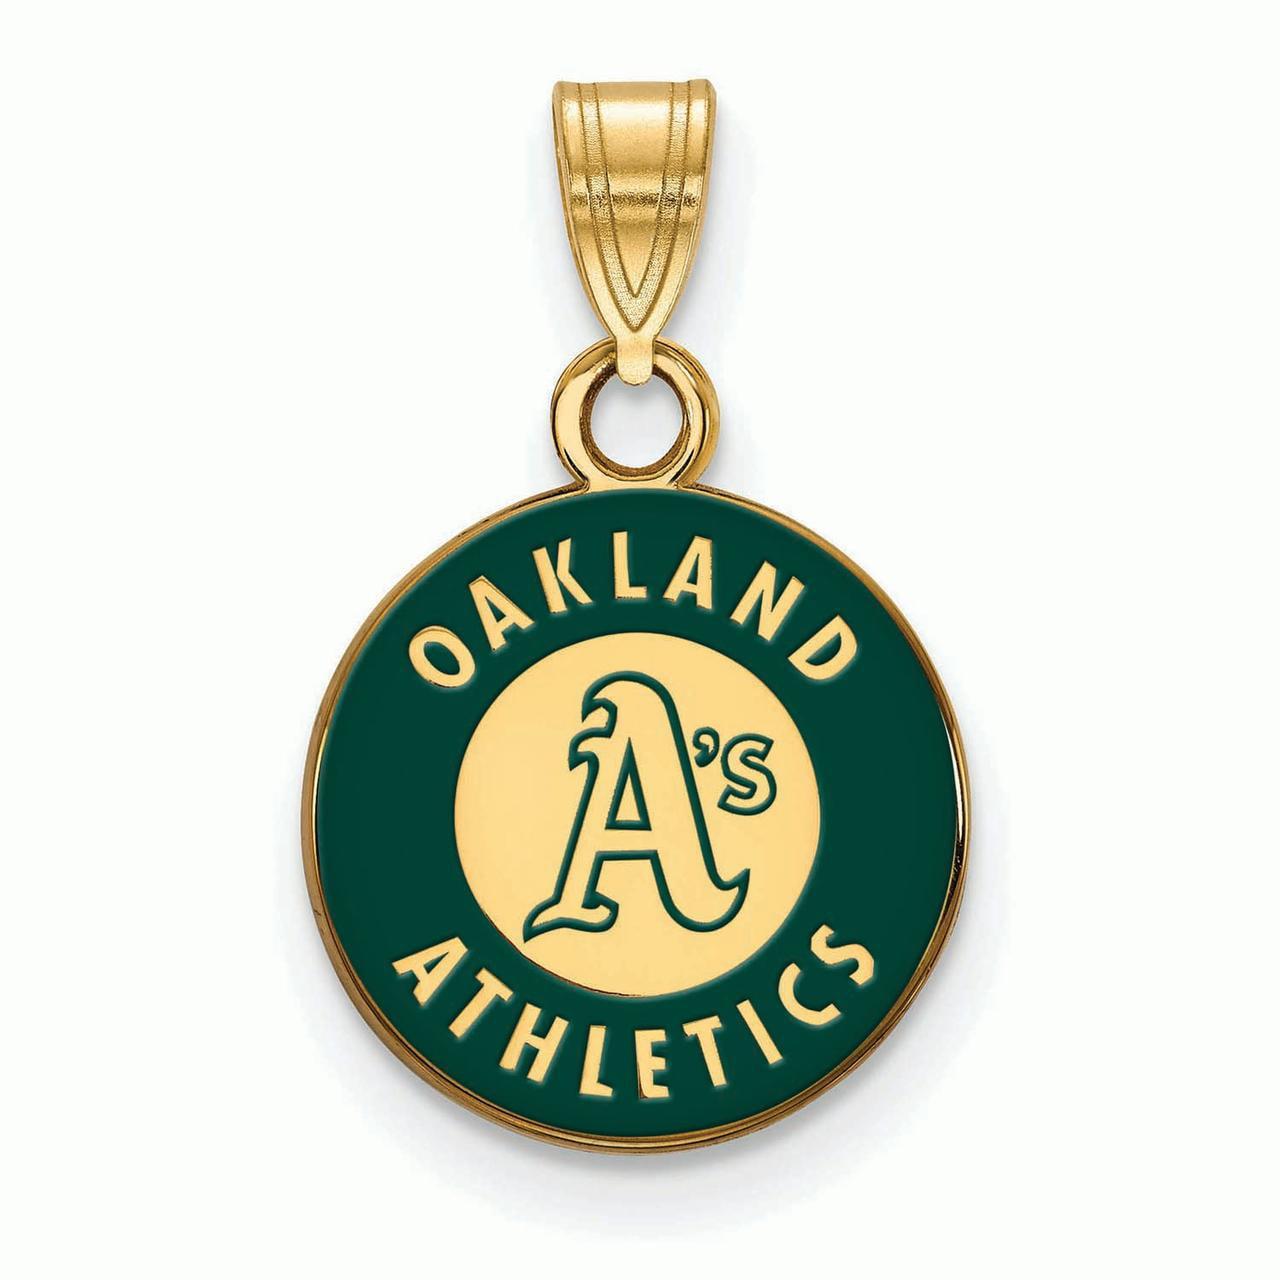 Oakland Athletics Women's Gold-Plated Enamel Pendant - No Size